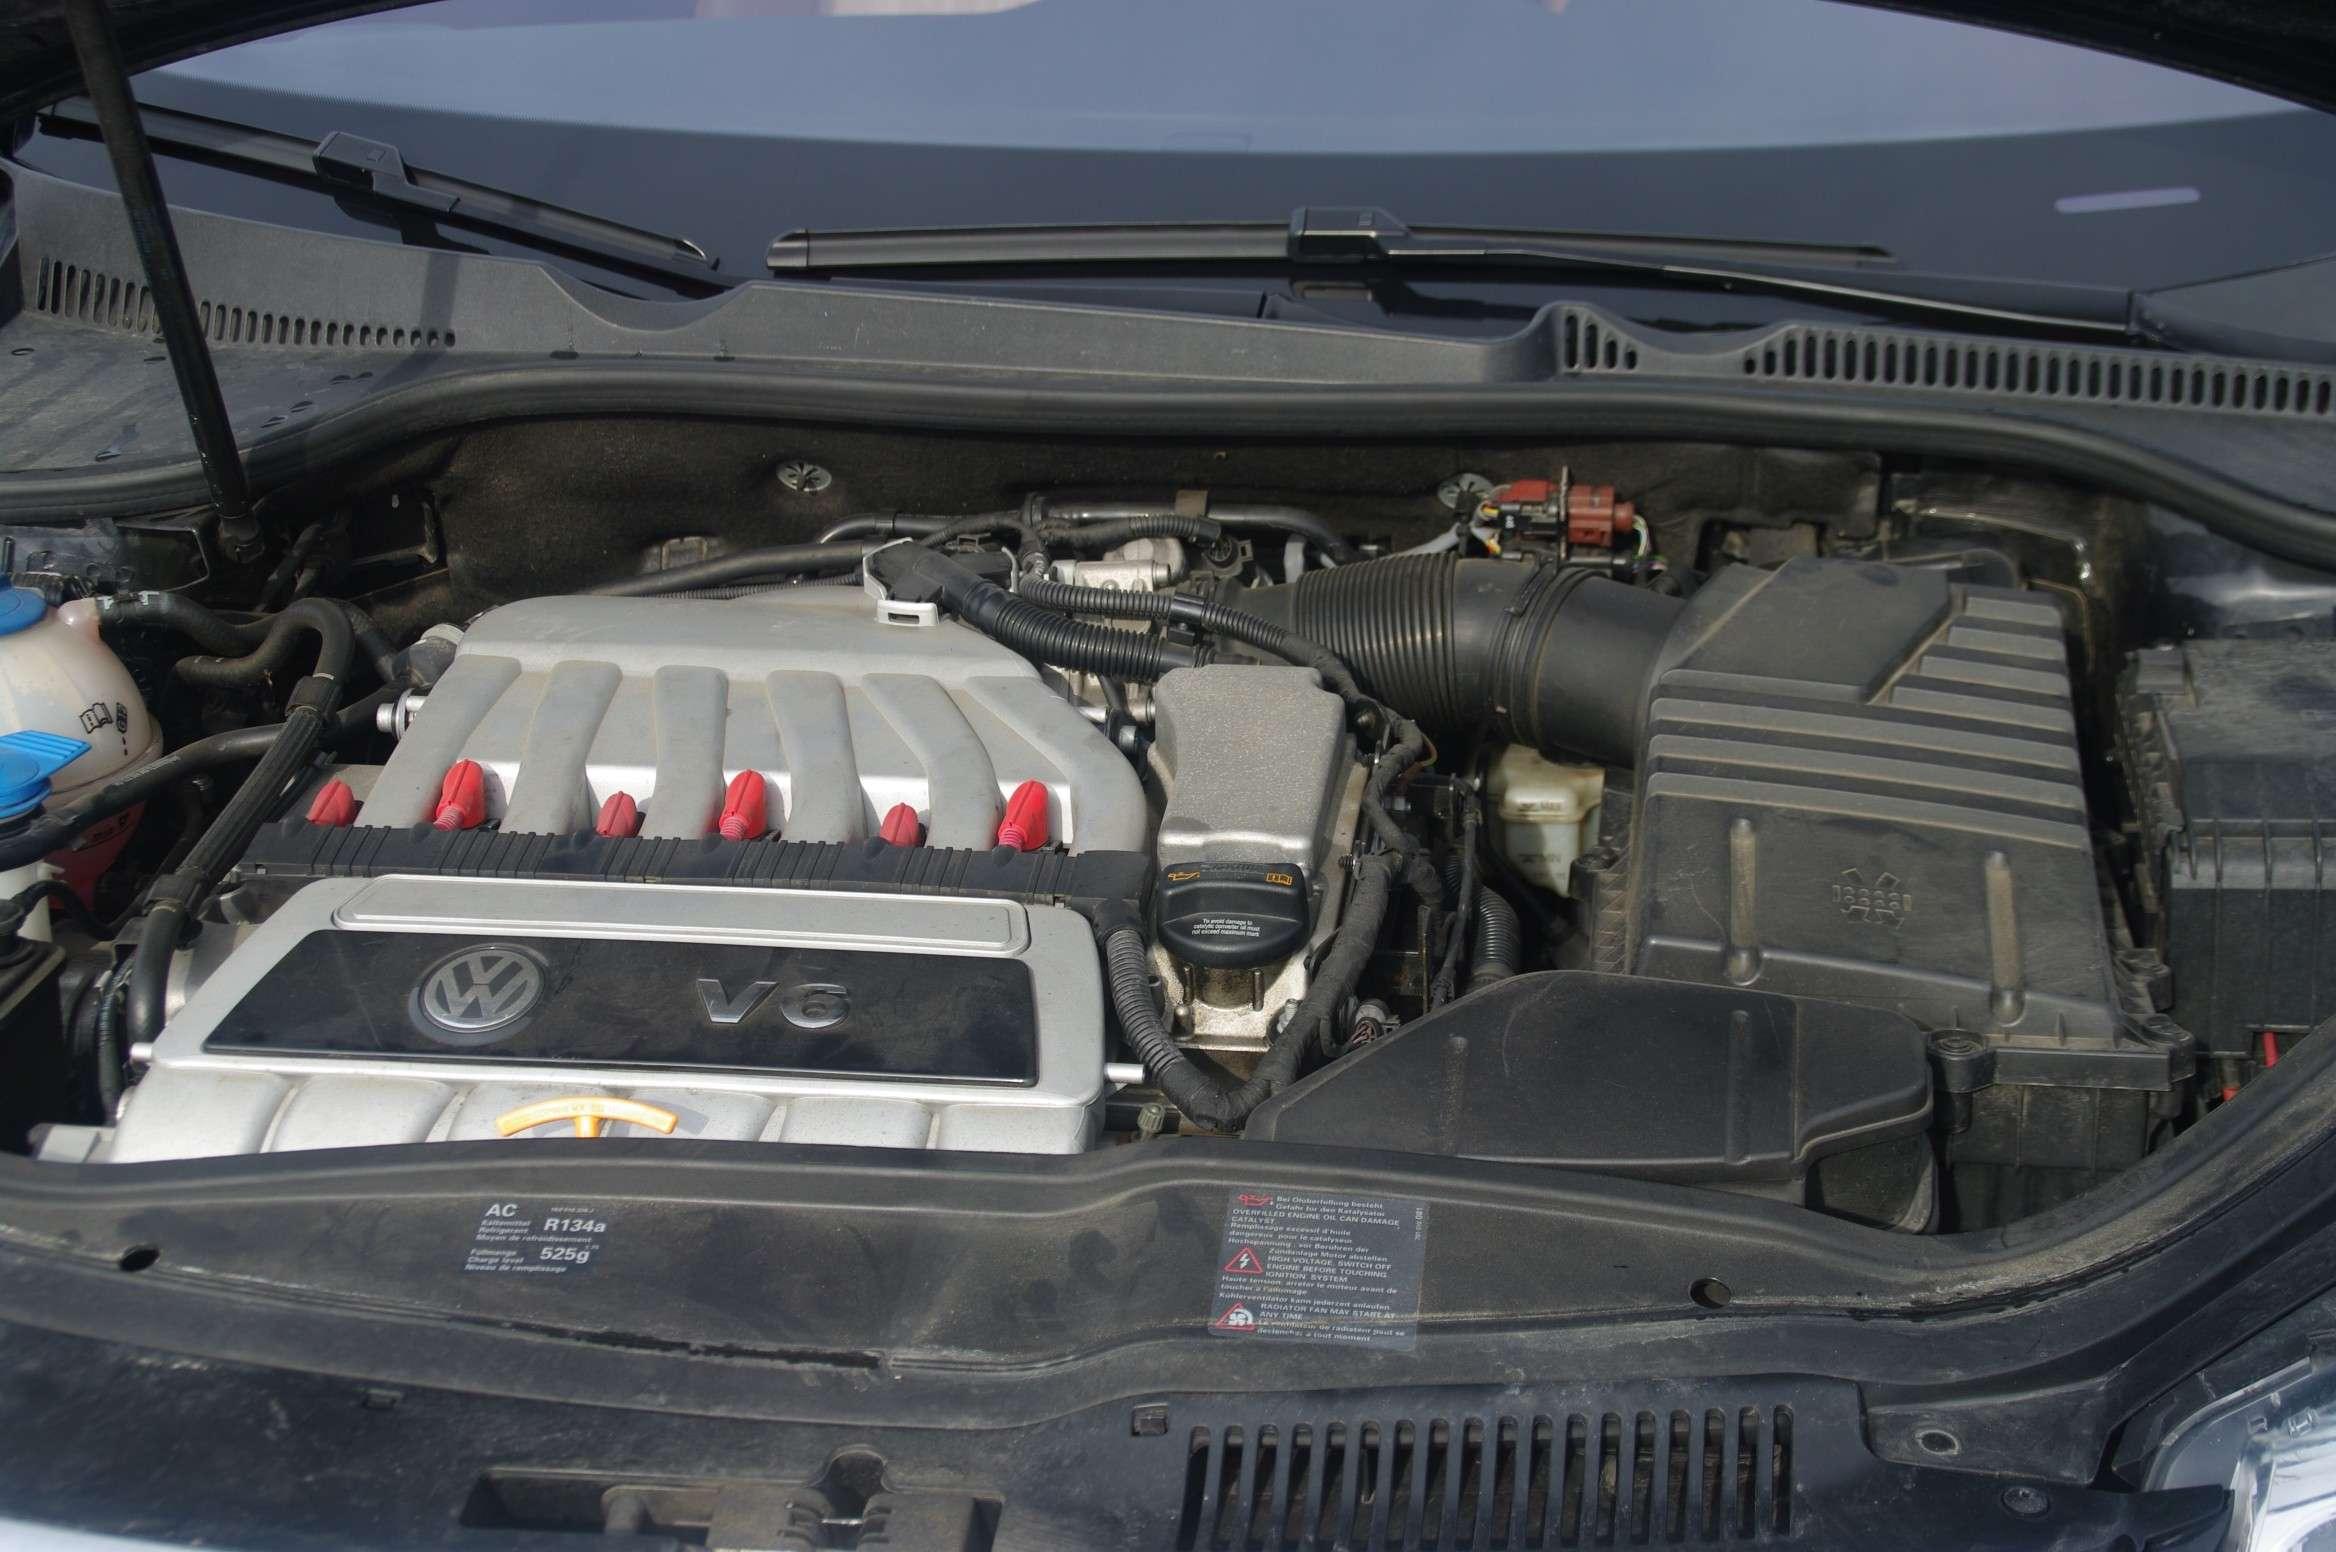 [FURB59] Renaut Clio 5 - Intens TCE 100 Imgp6516